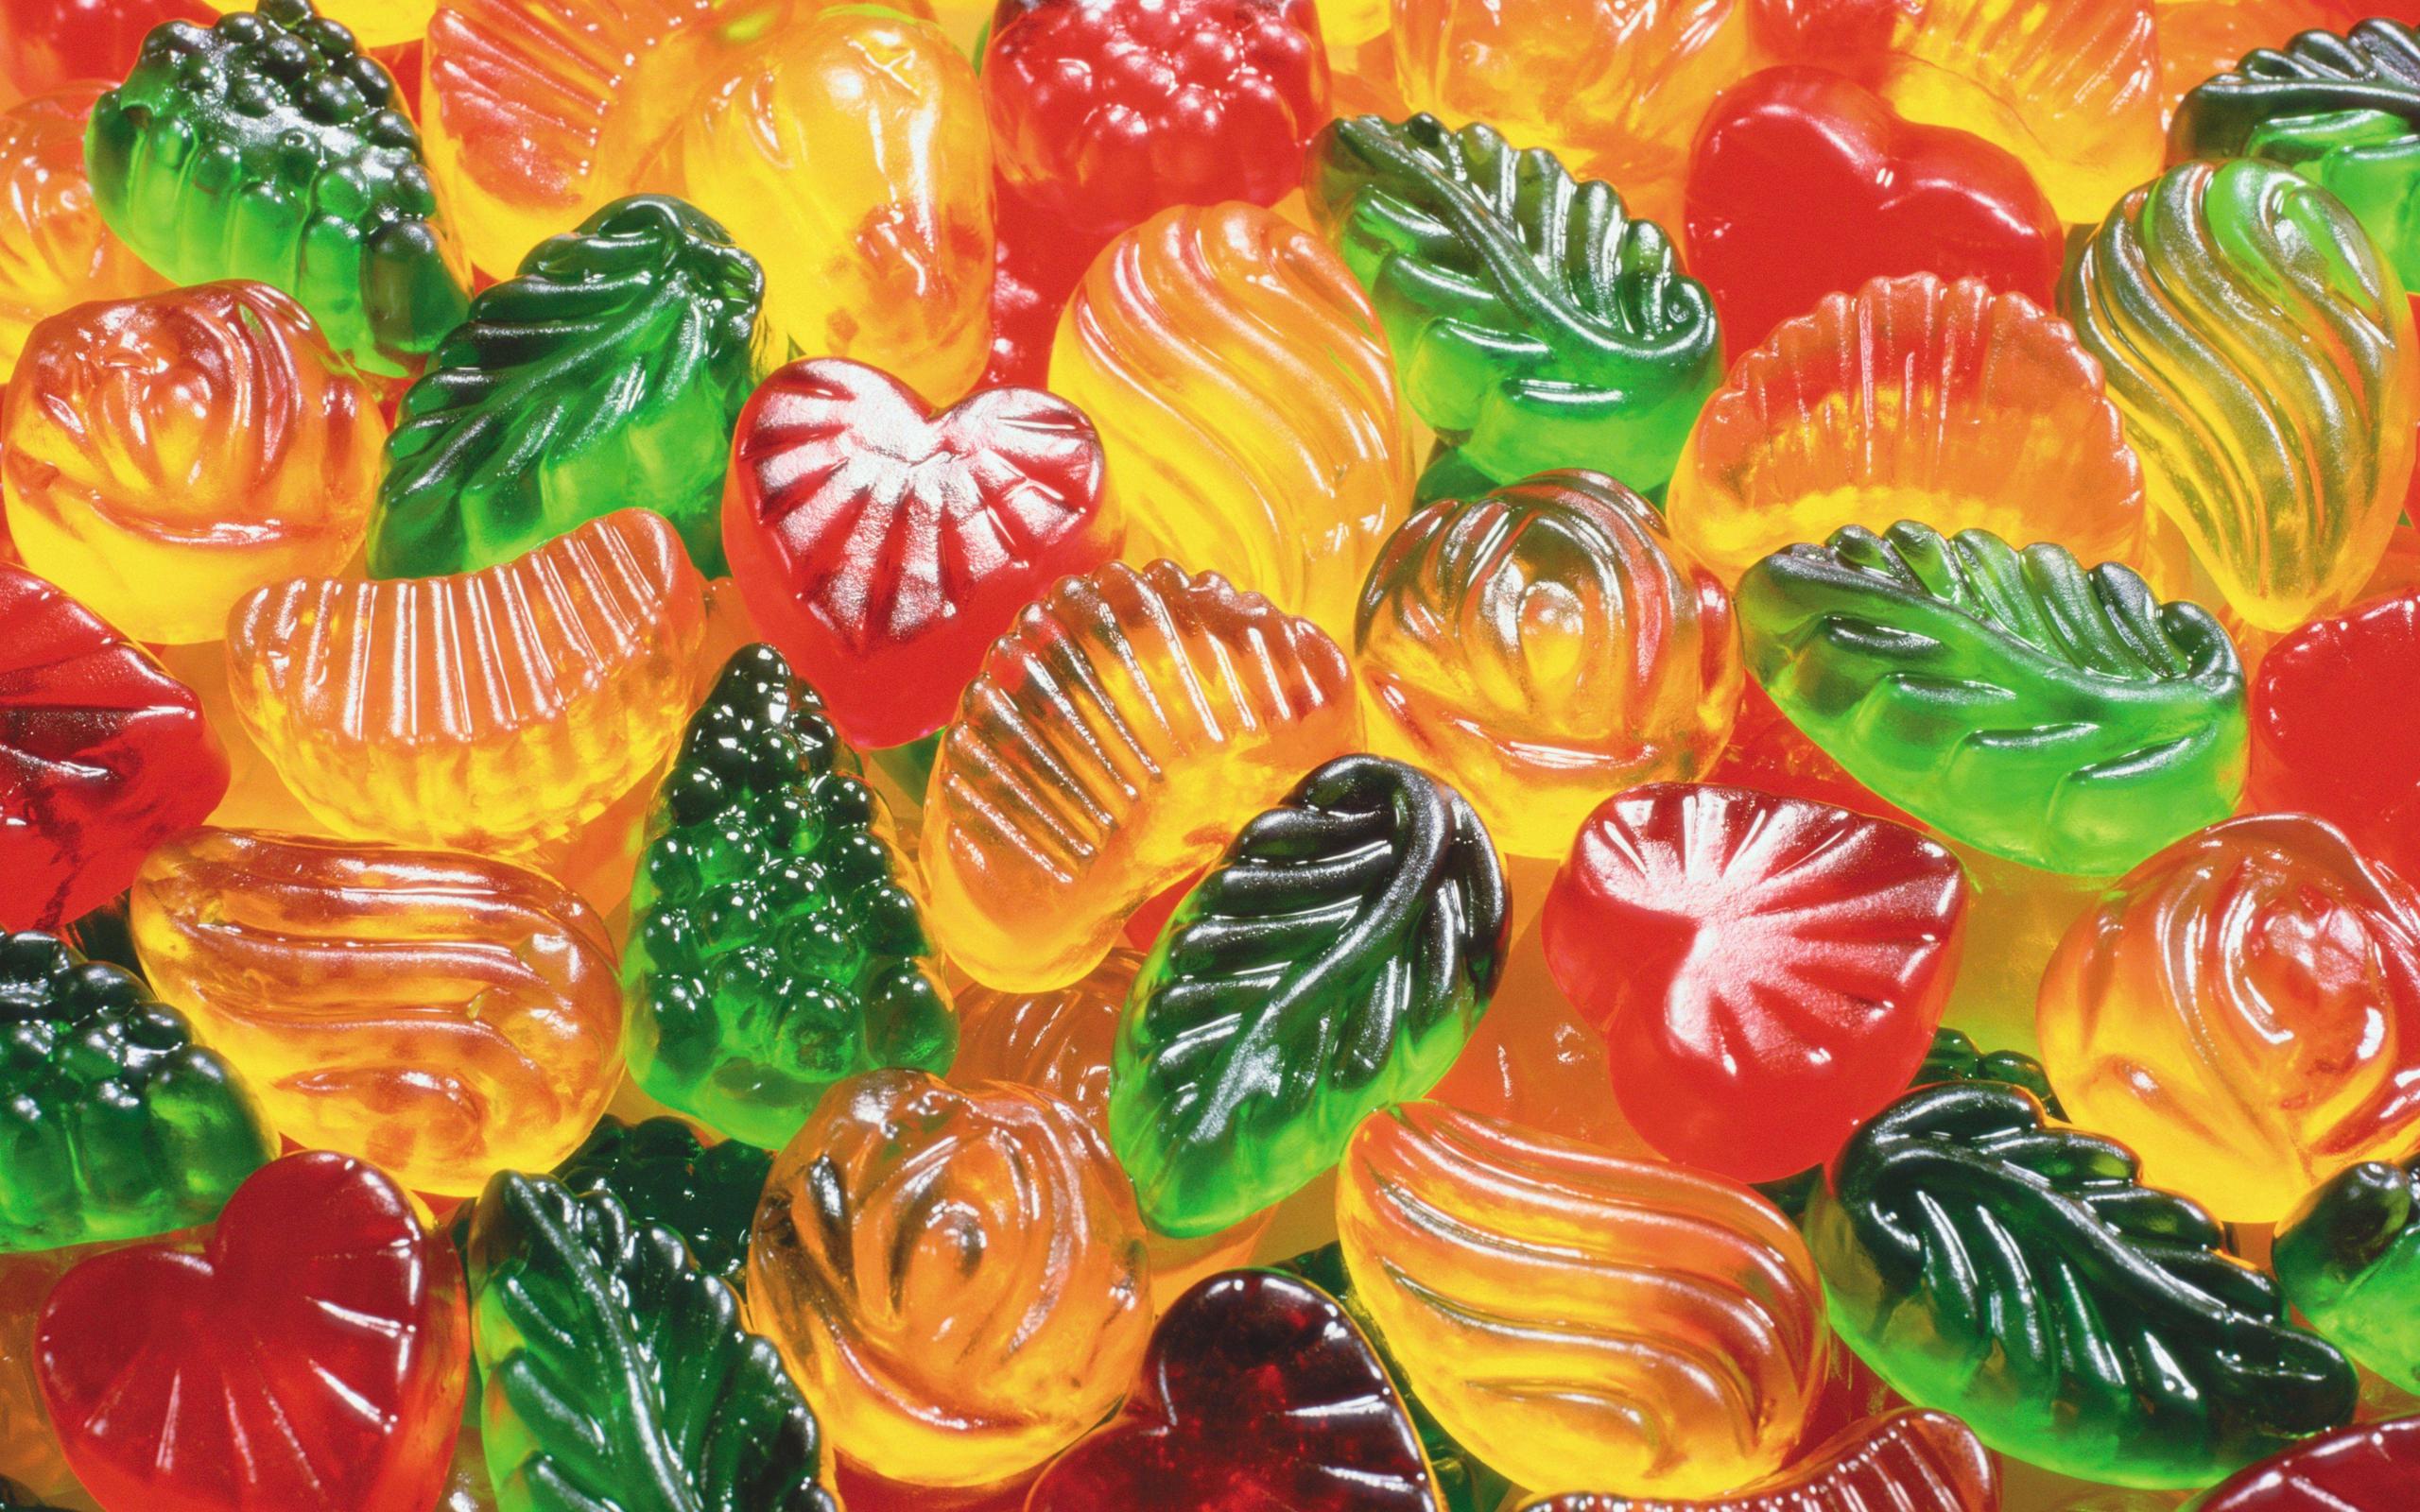 Chewy Fruity Candies - Chewy Fruity Candies